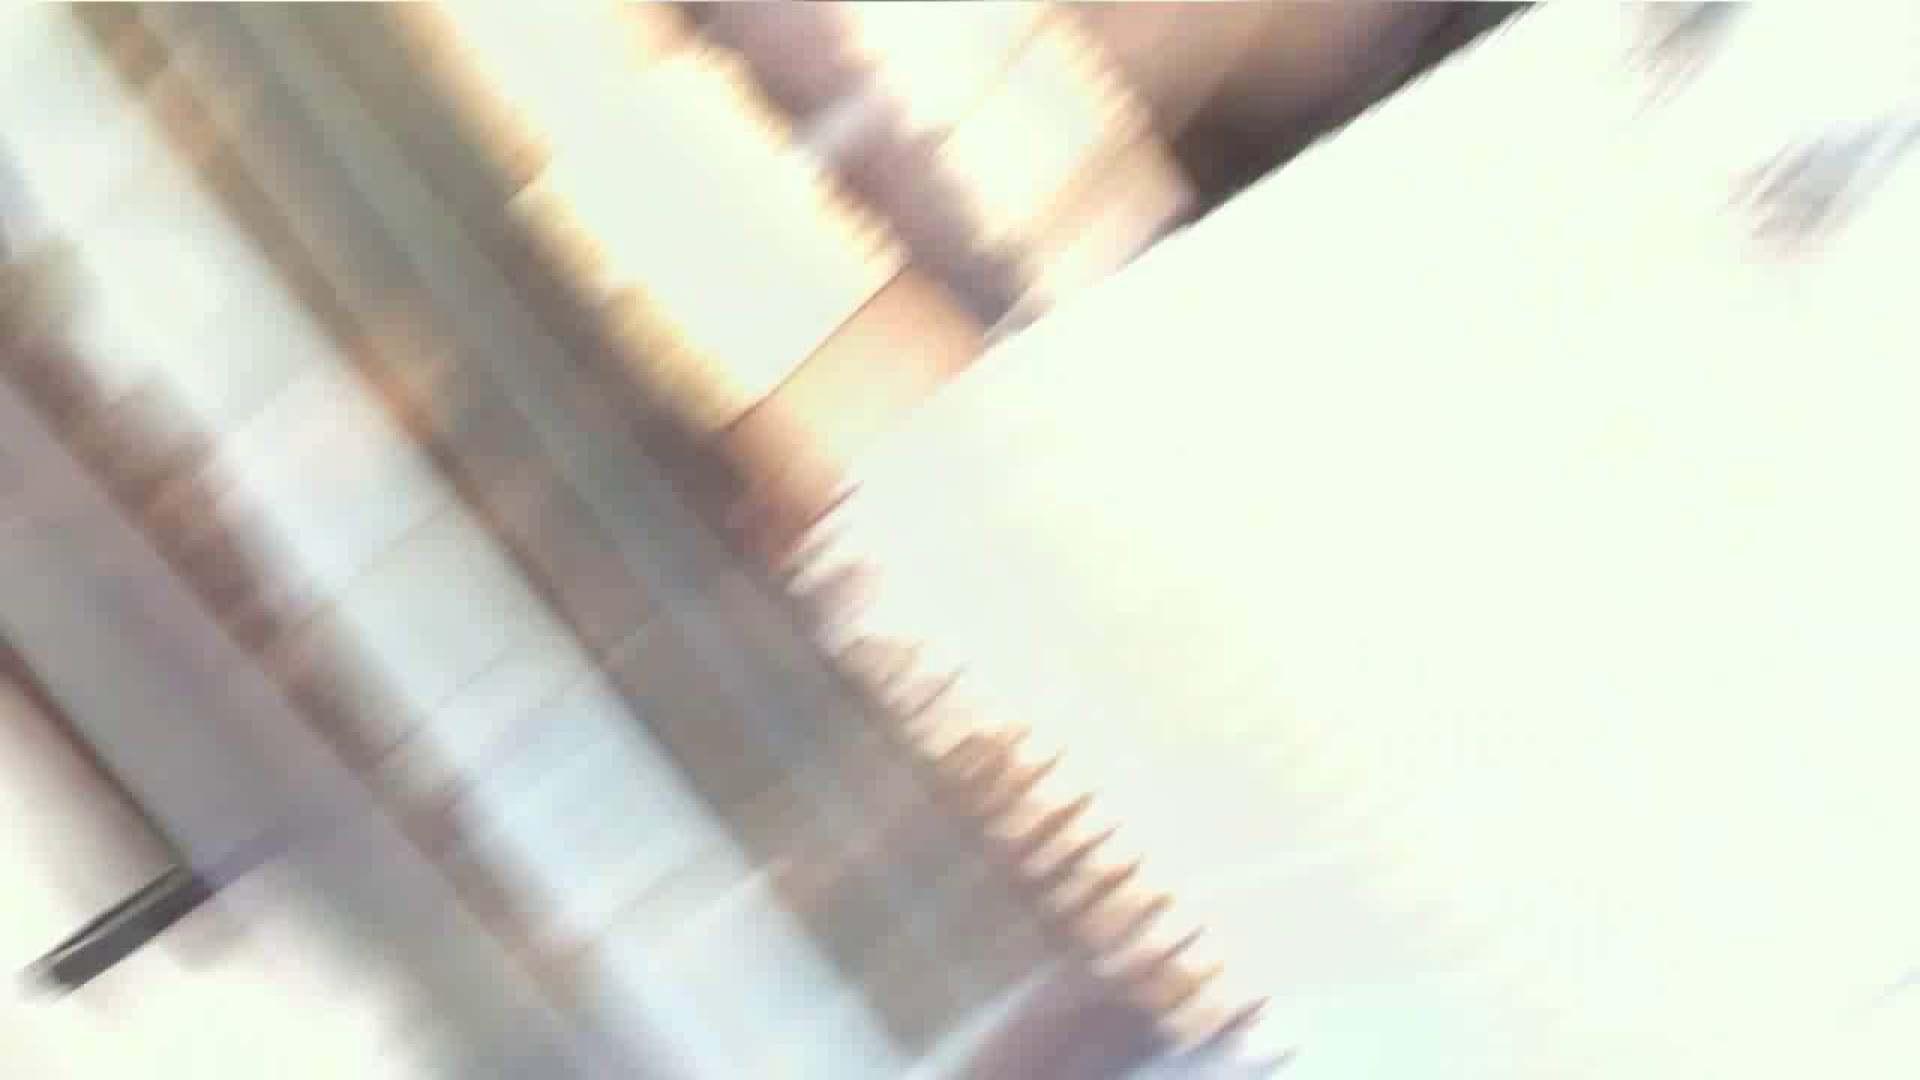 vol.36 美人アパレル胸チラ&パンチラ ポニテ(゚∀゚)キタコレ!! 接写 AV動画キャプチャ 90PIX 41